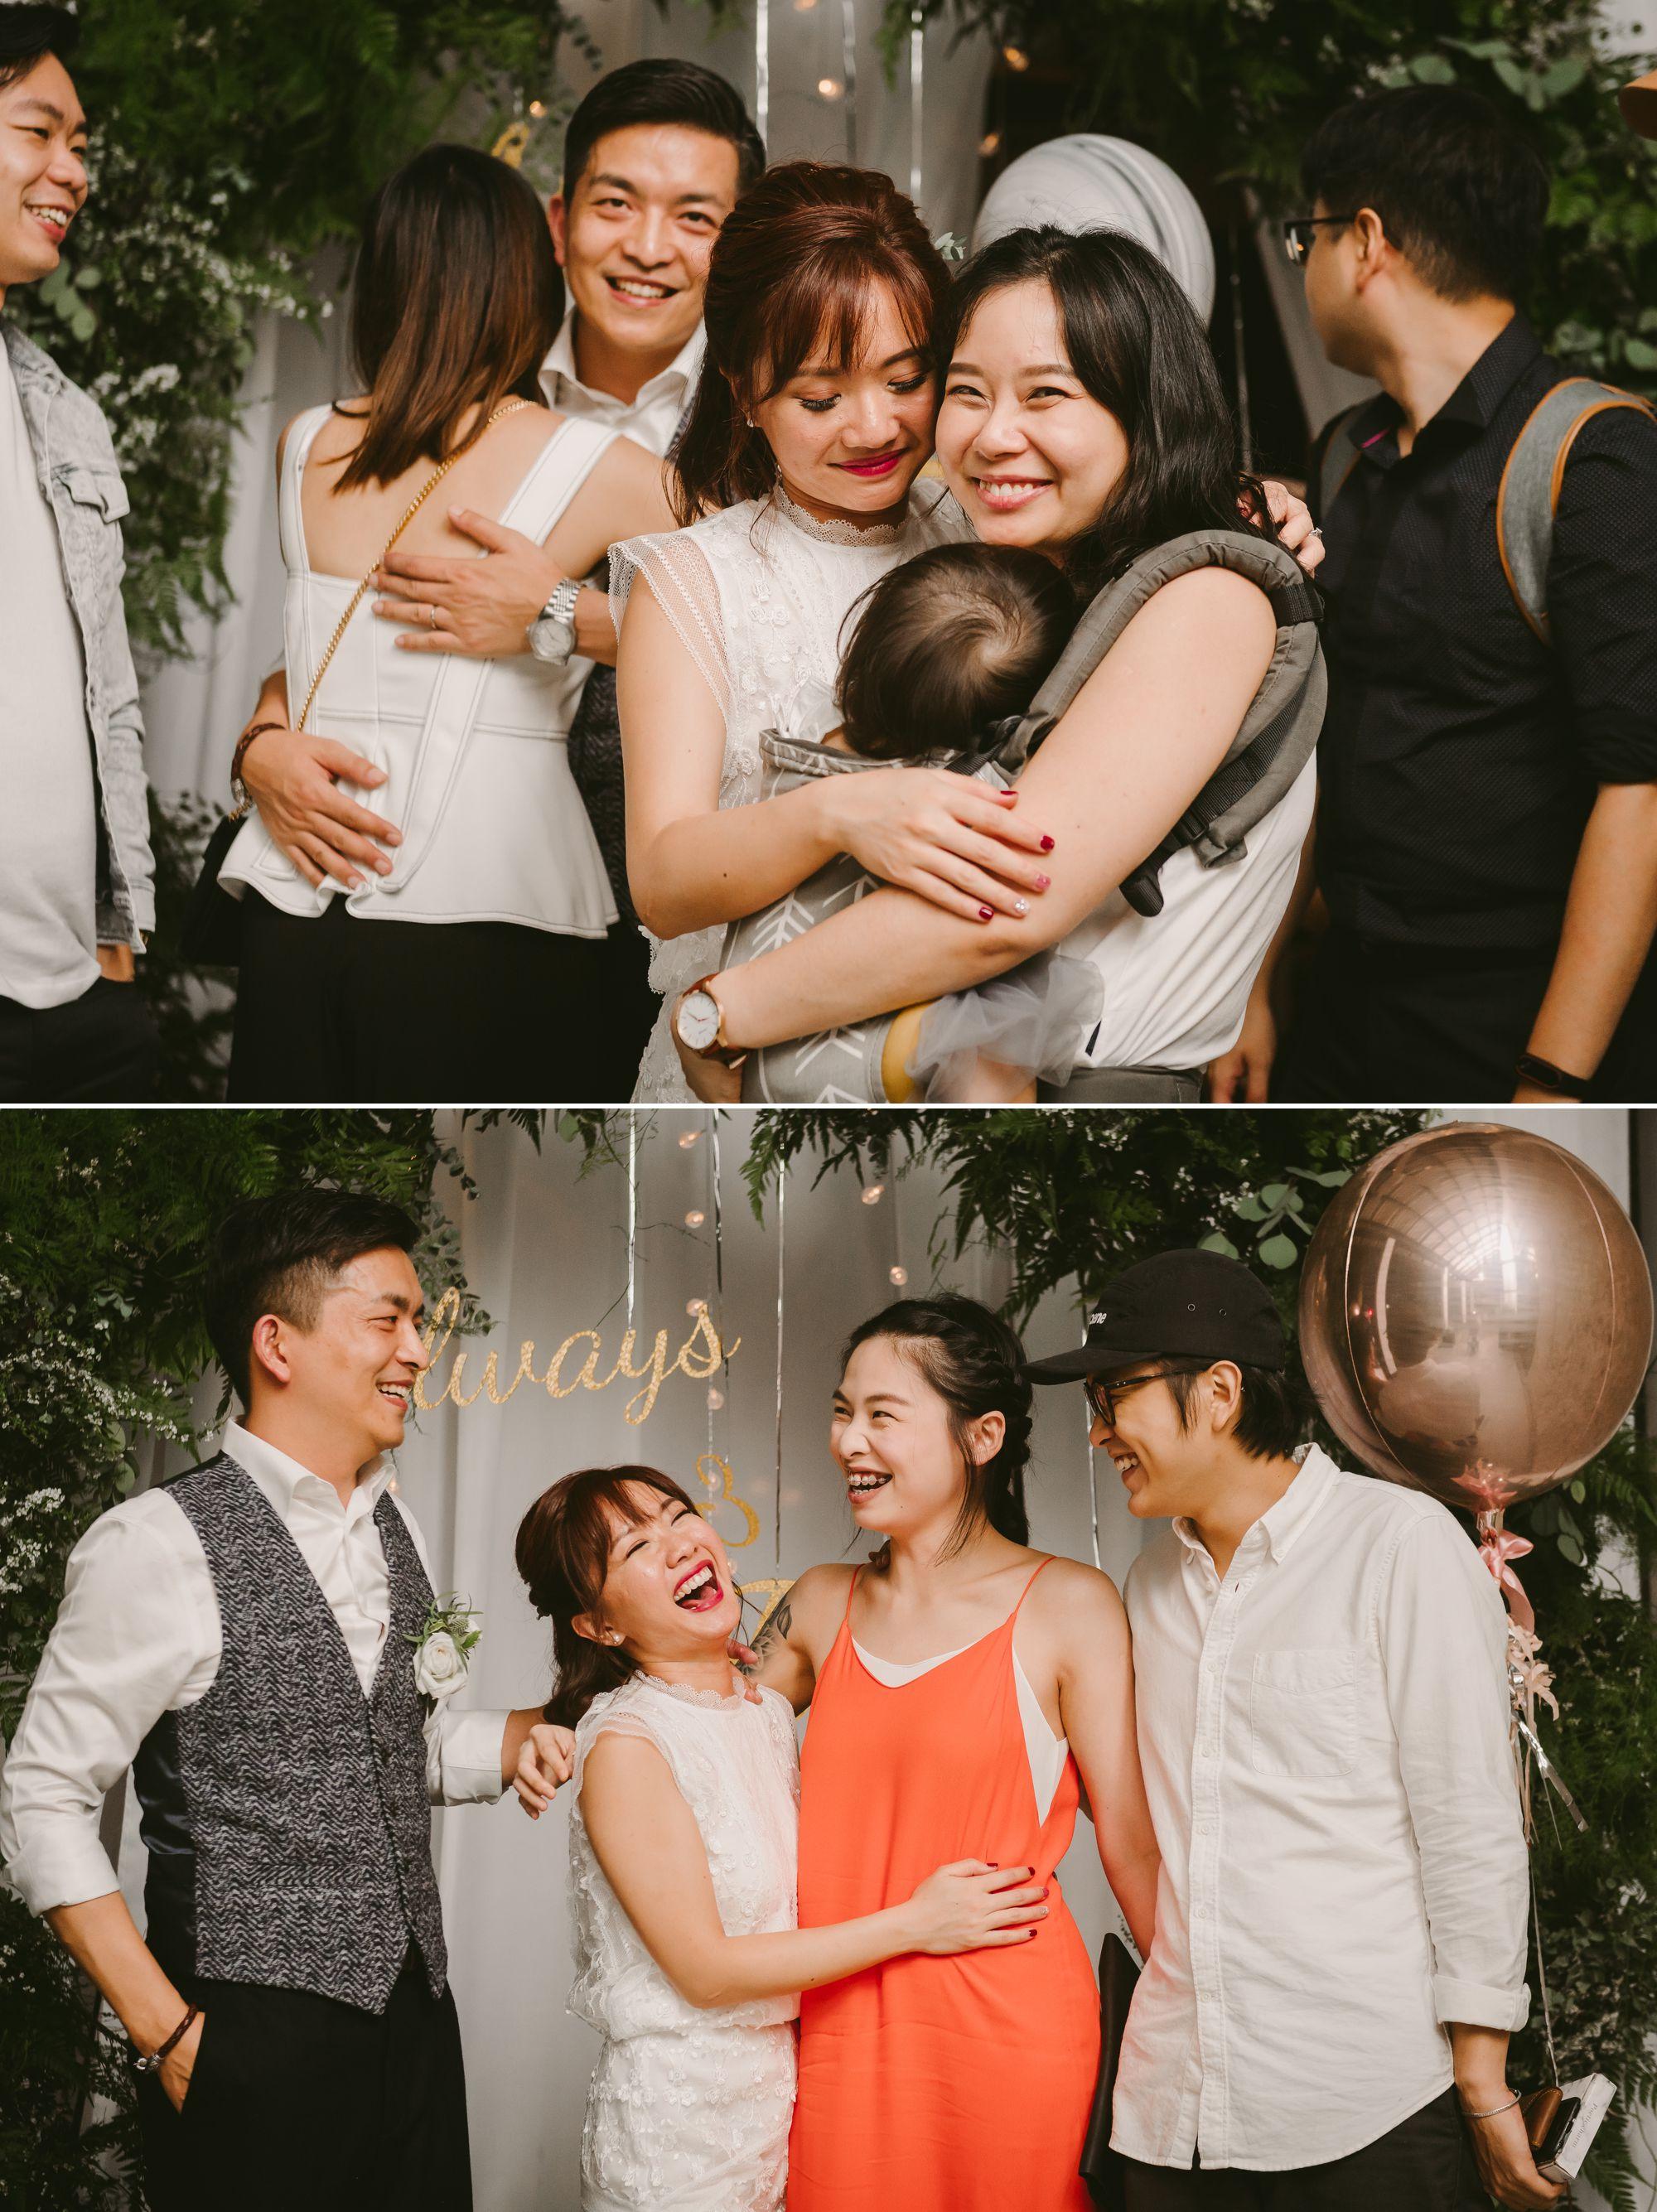 wedding_photography 43.jpg